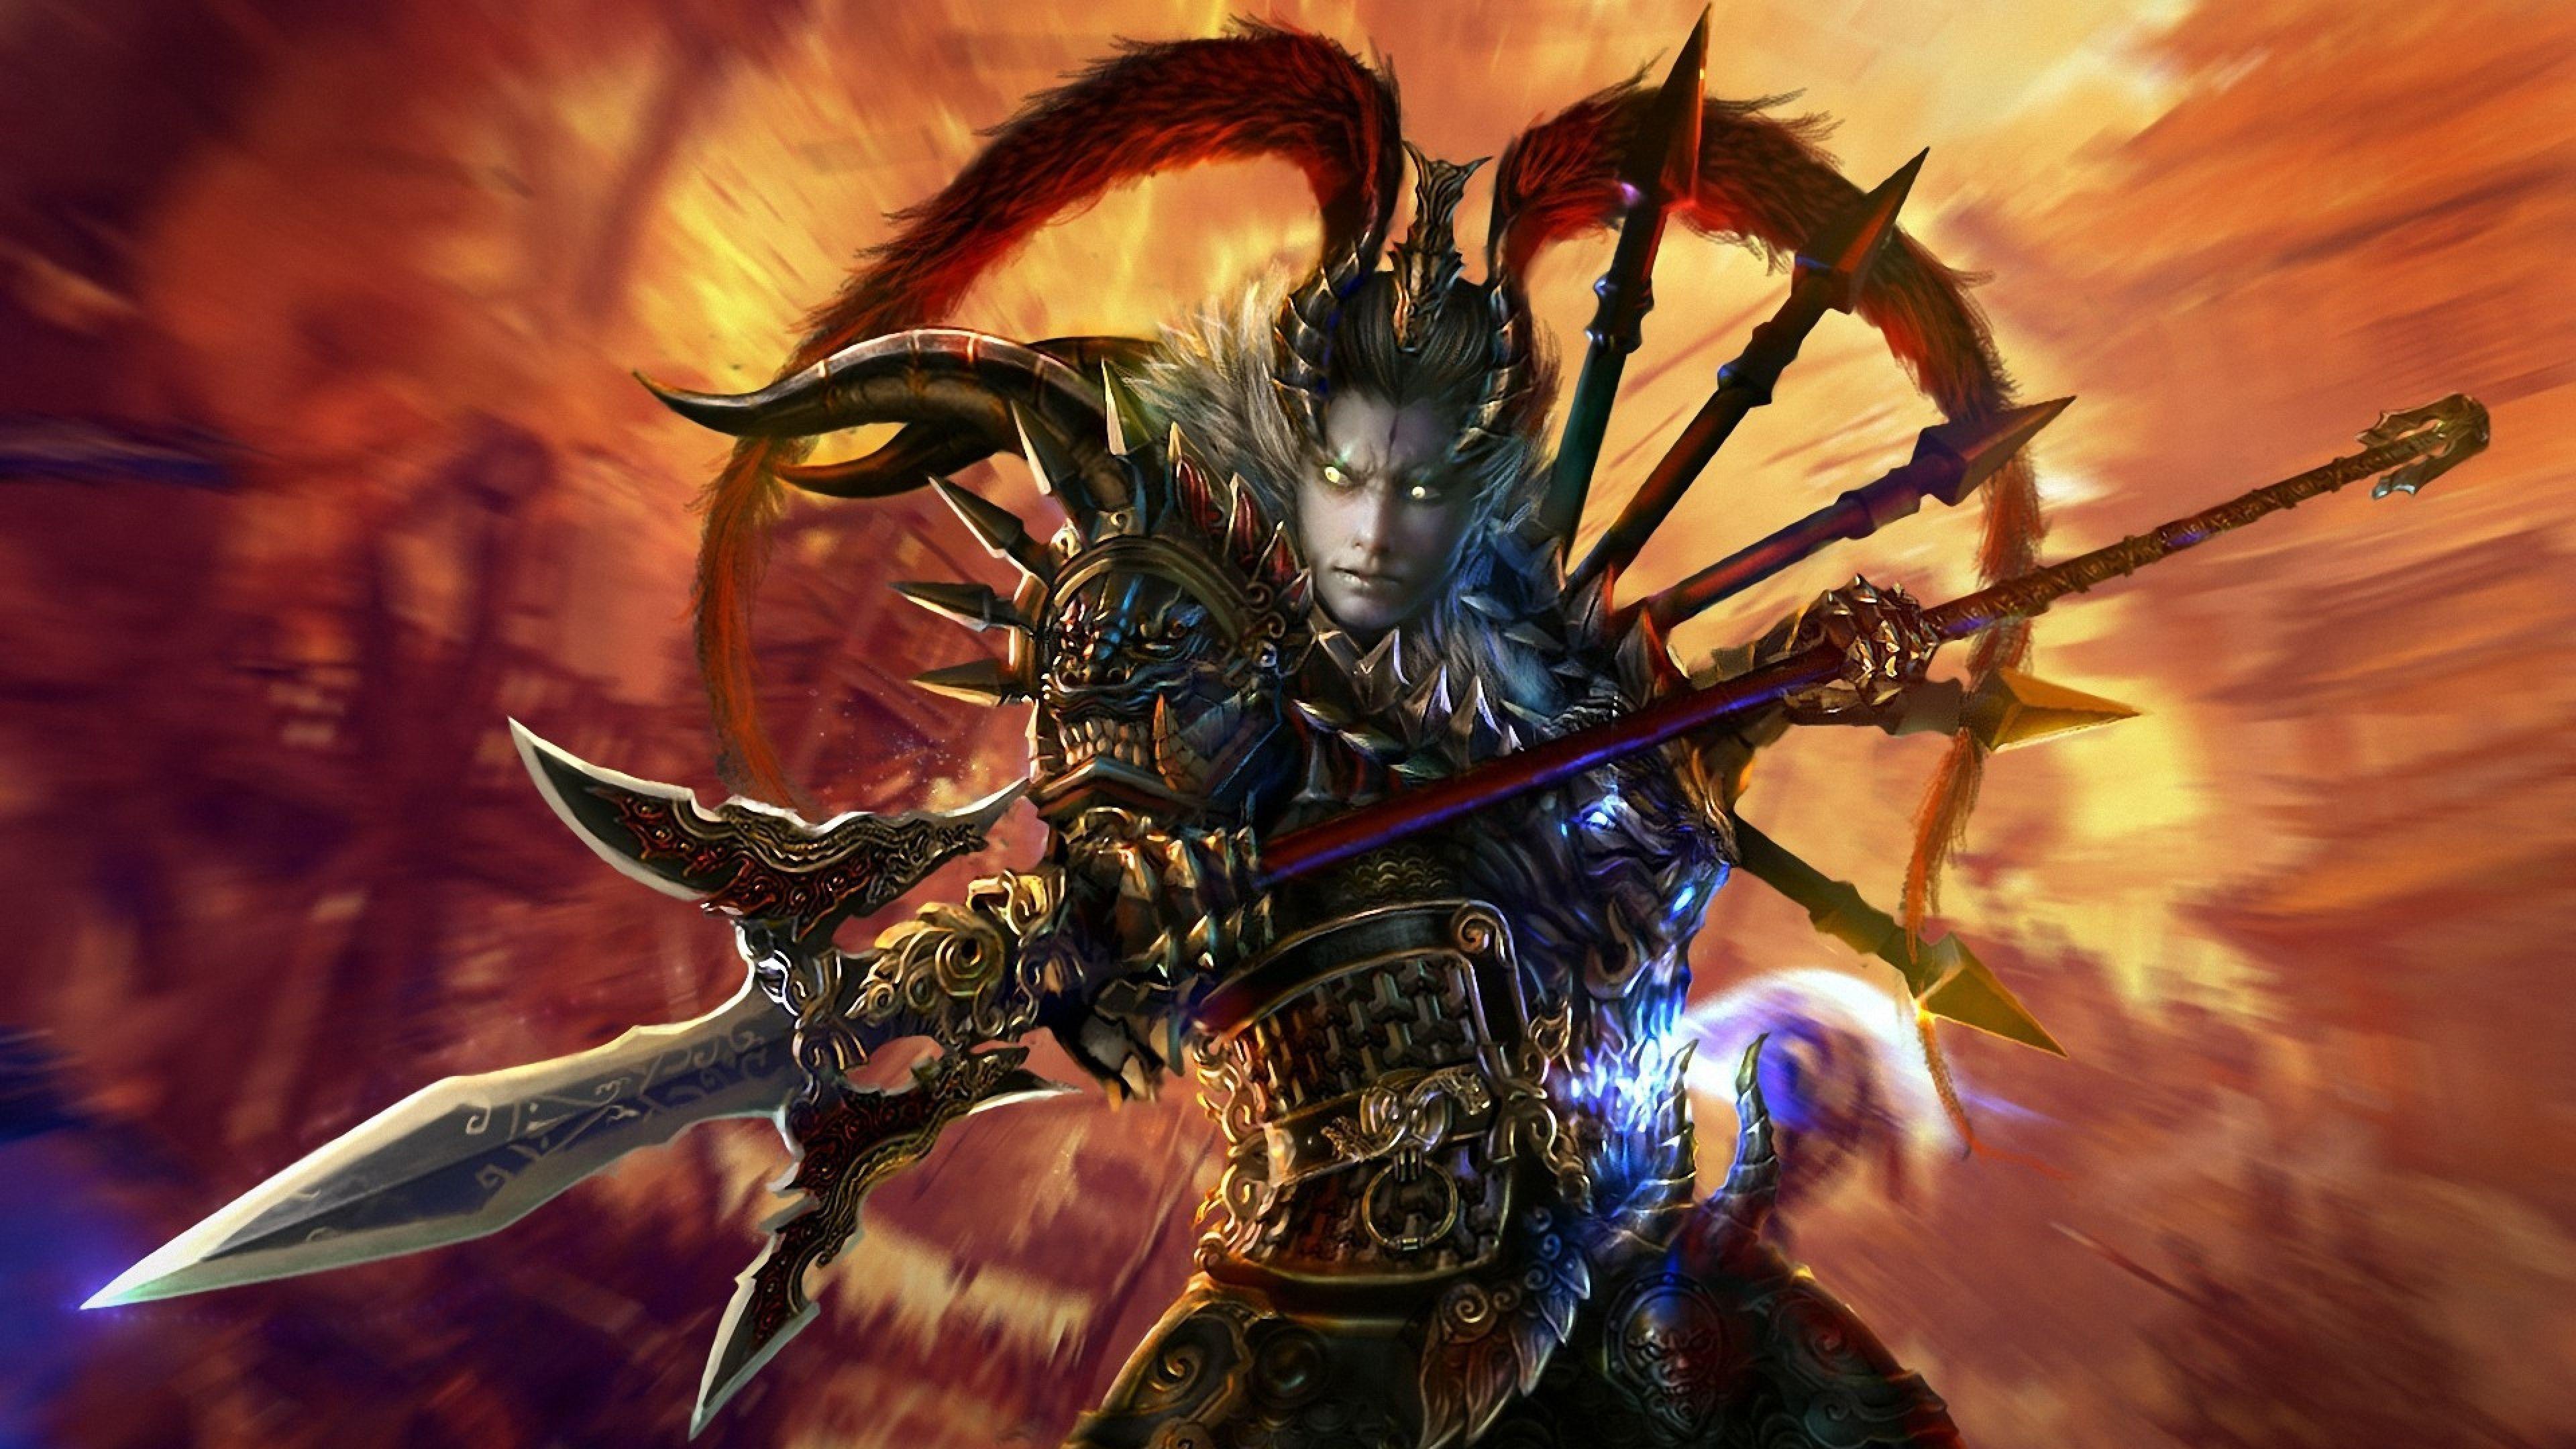 dynasty warriors 8 wallpapers hd lu bu wallpaper cave